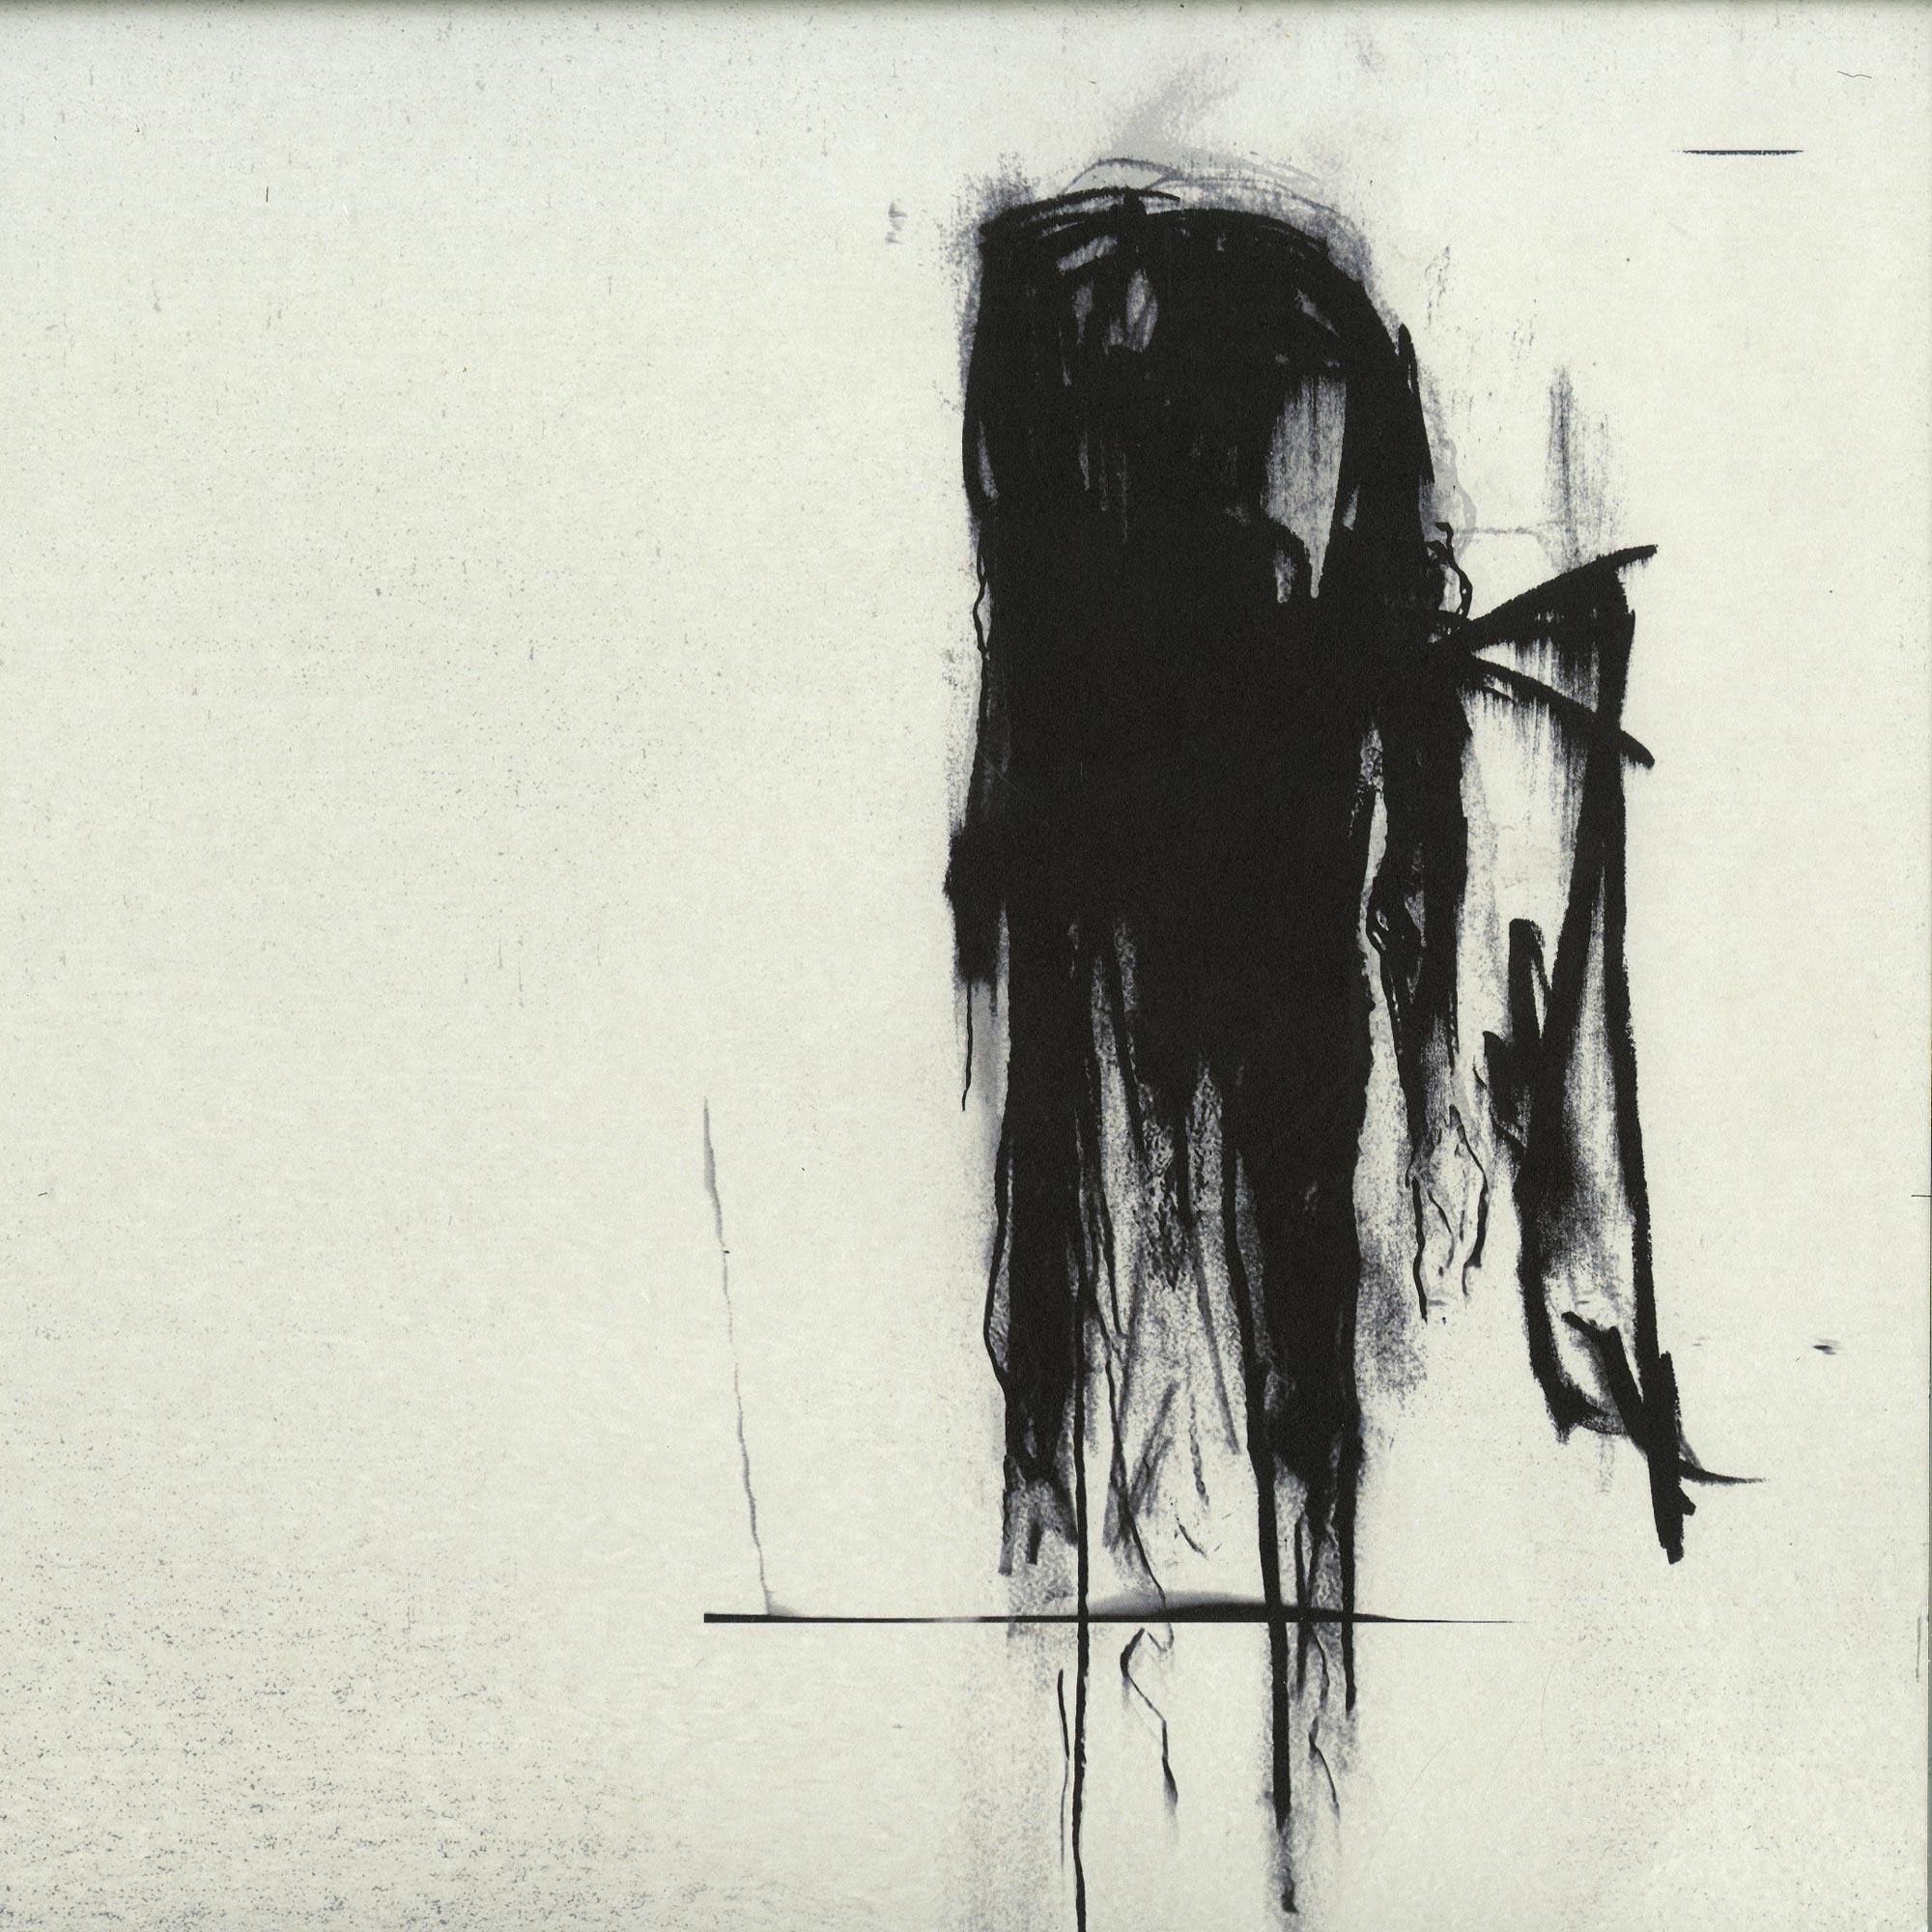 Charlotte De Witte - VOICES OF THE ANCIENT EP